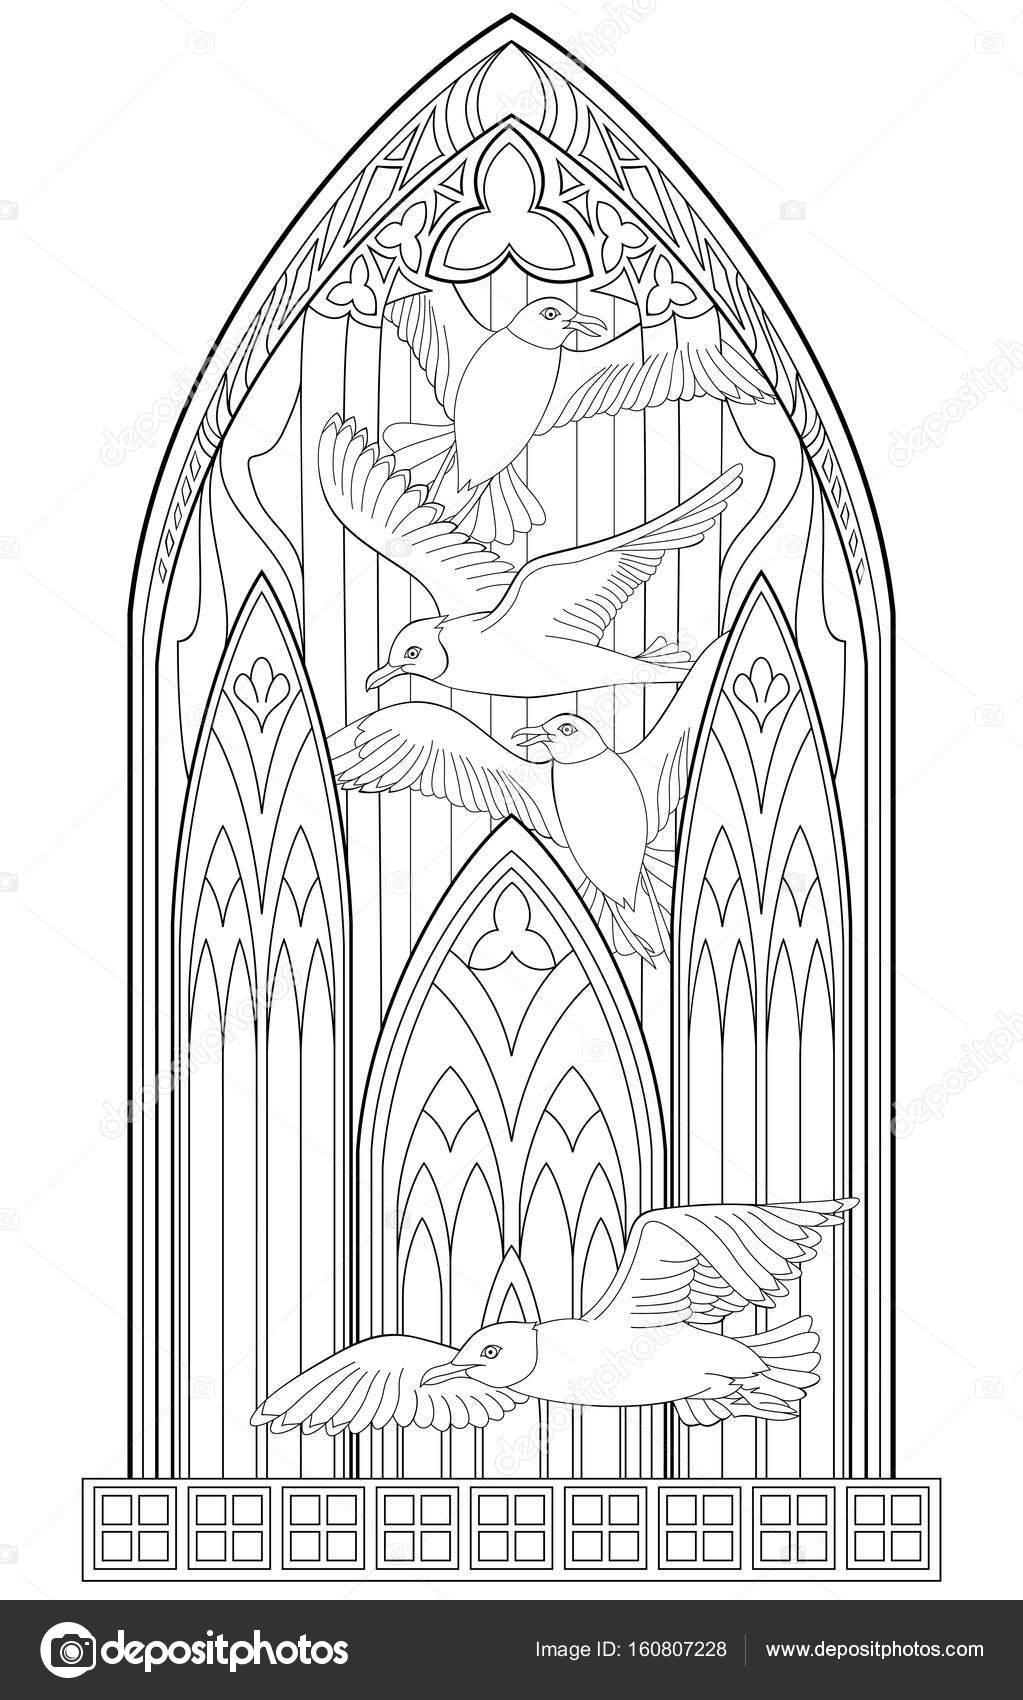 Kirchenfenster Gotik Malvorlage | Coloring And Malvorlagan in Kirchenfenster Malvorlage